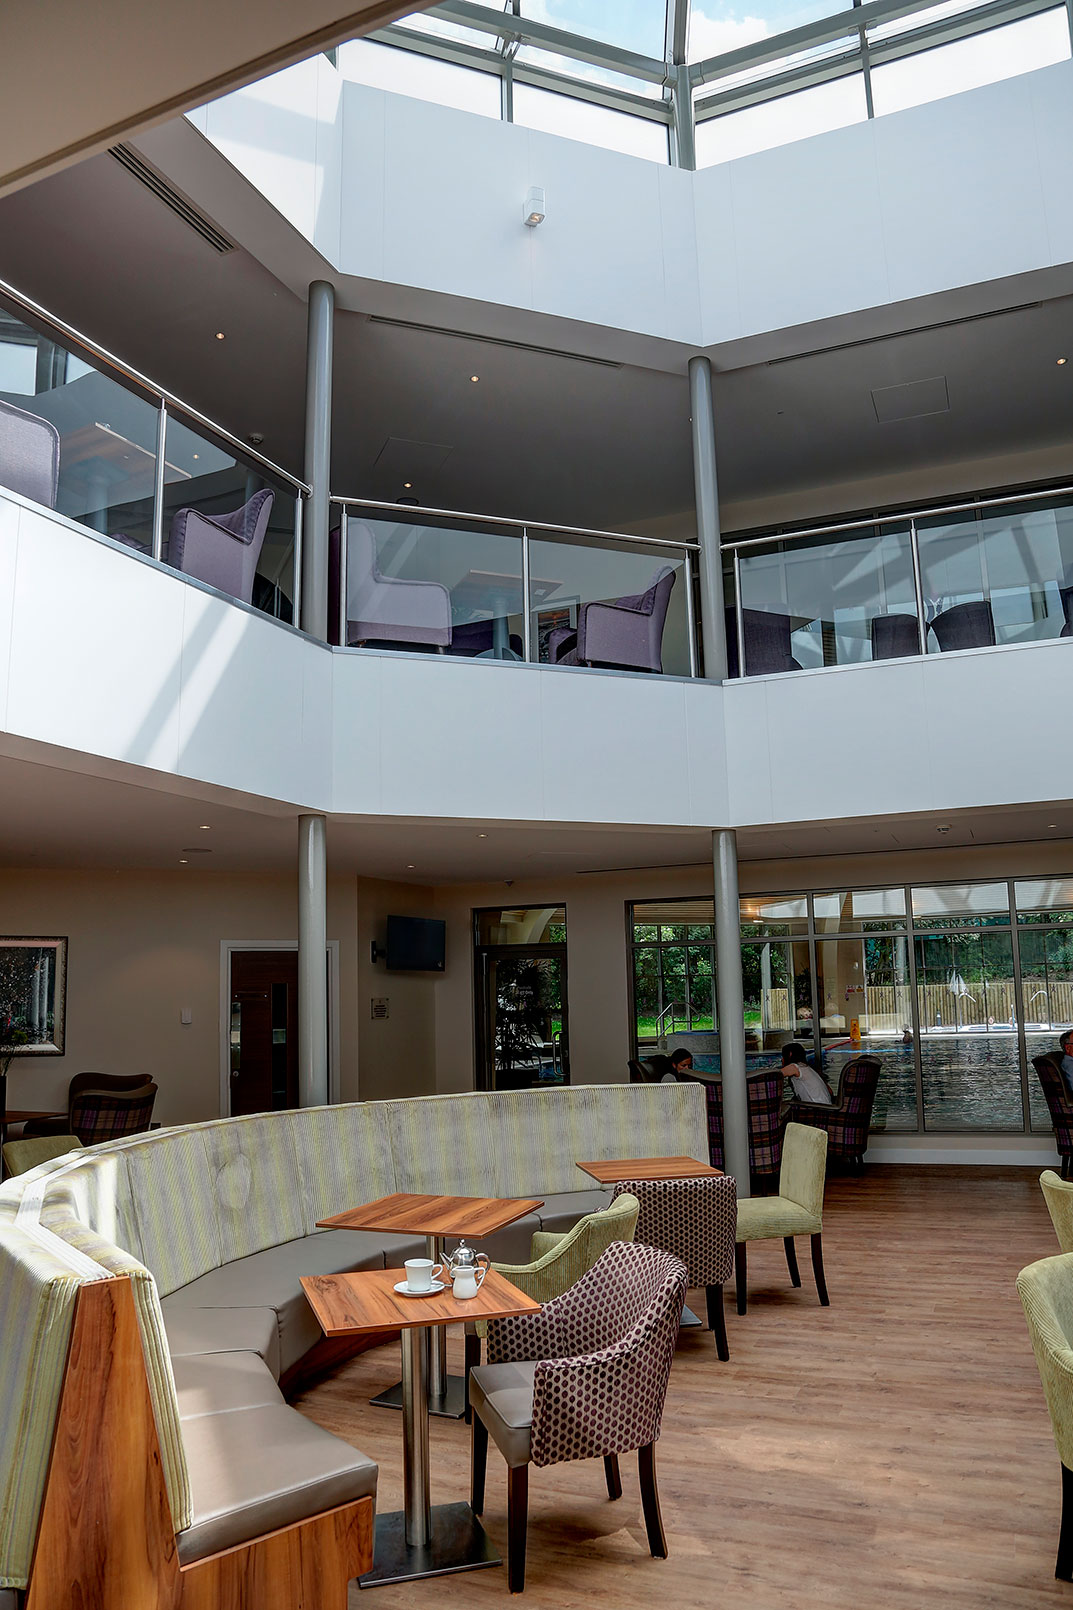 Best Western Hotel Room: Best Western Plus Kenwick Park Hotel